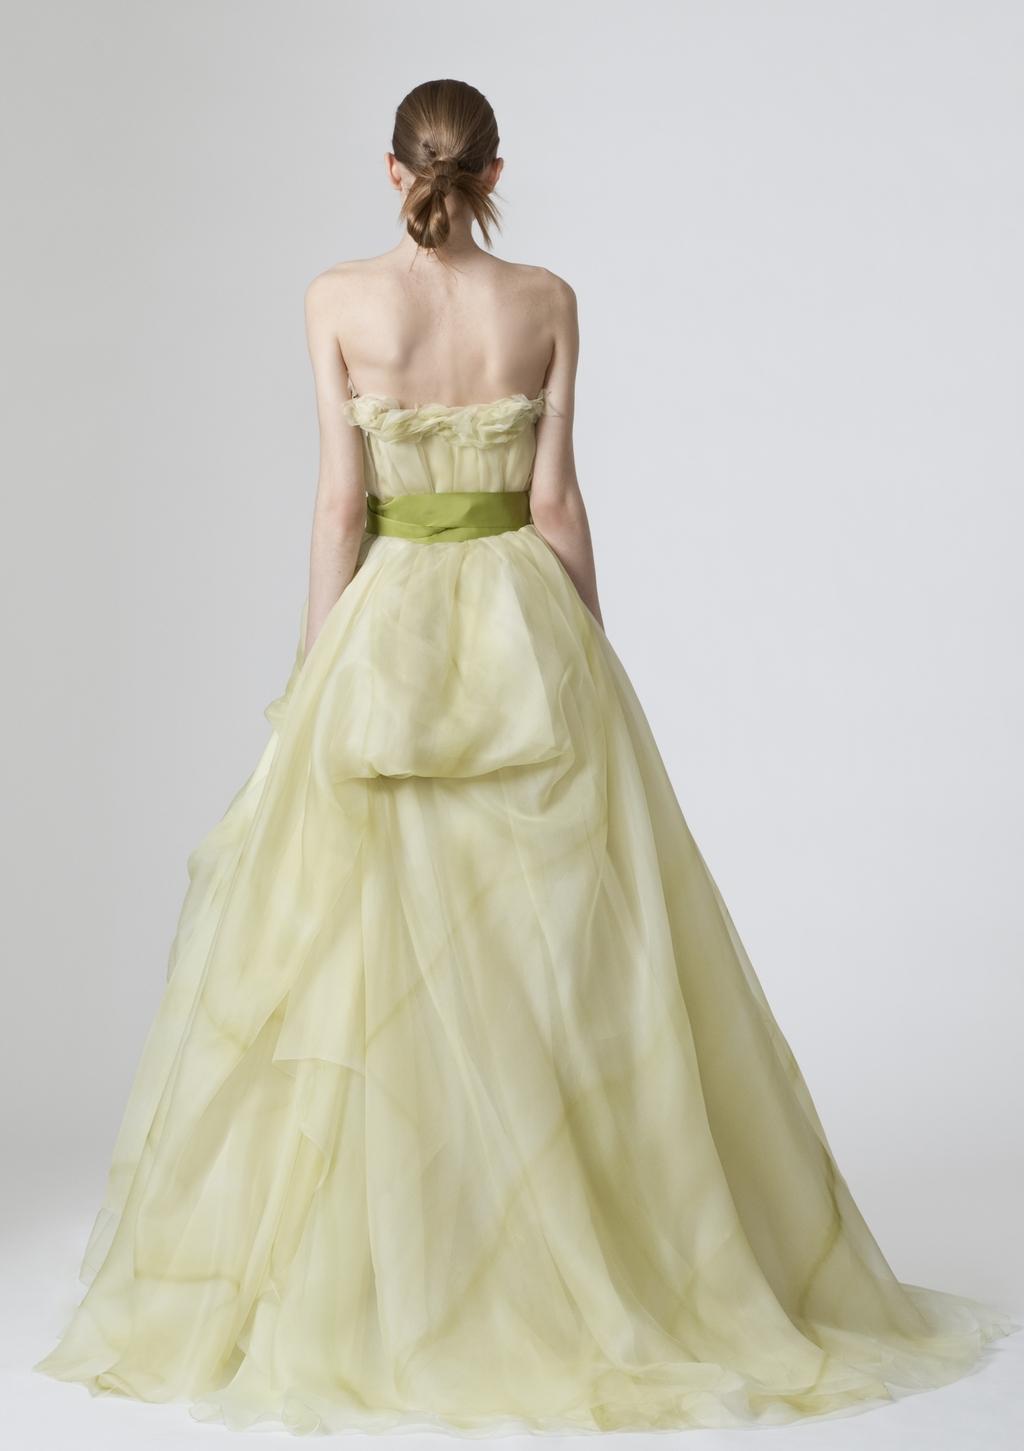 Vera-wang-wedding-dresses-spring-2010-9-back.full